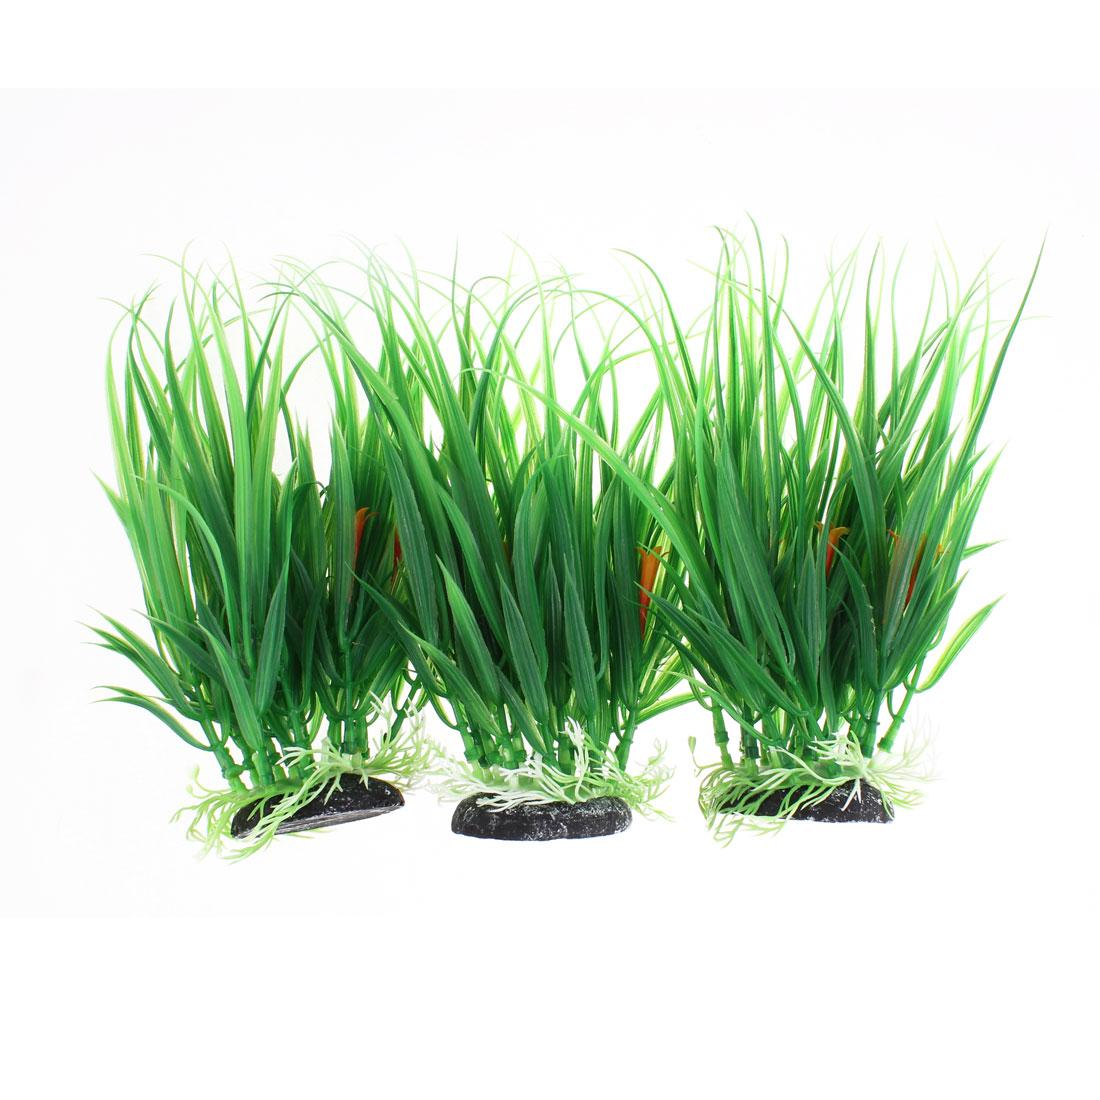 Fish Tank Fishbowl Water Plant Landscape Grass Green 19 x 13cm 3pcs